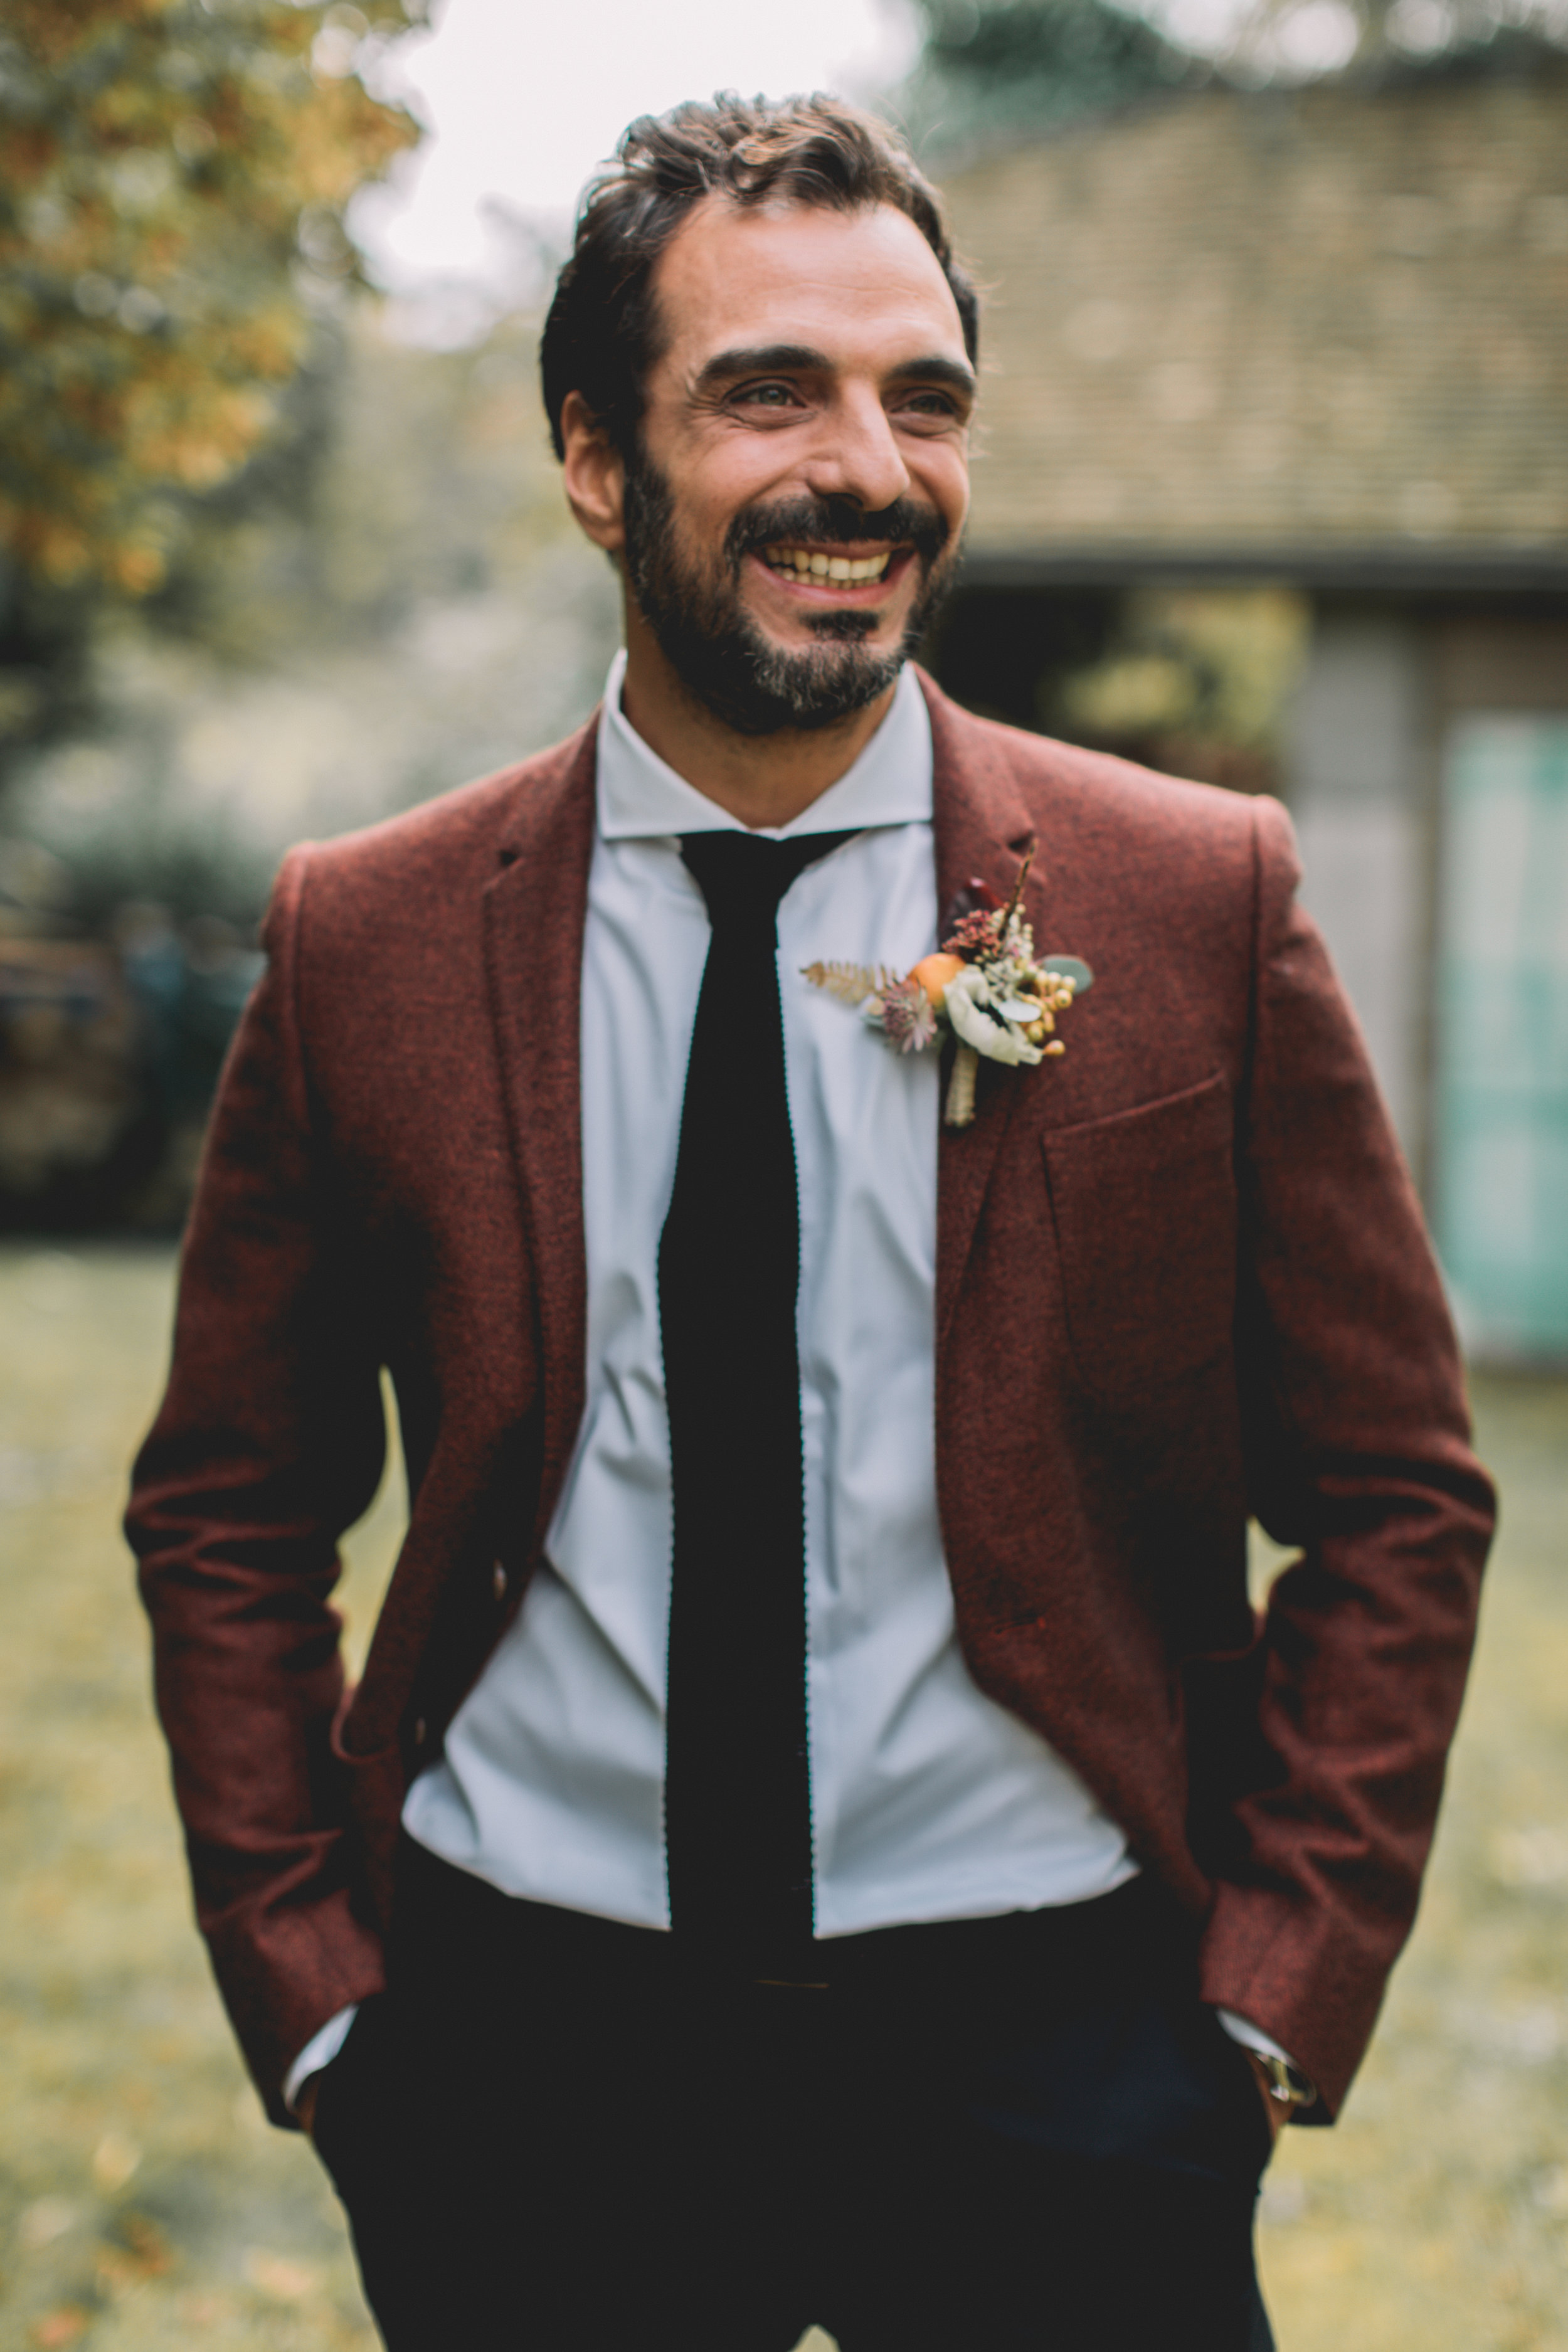 bröllop+boho+höst+kostym+brudgum